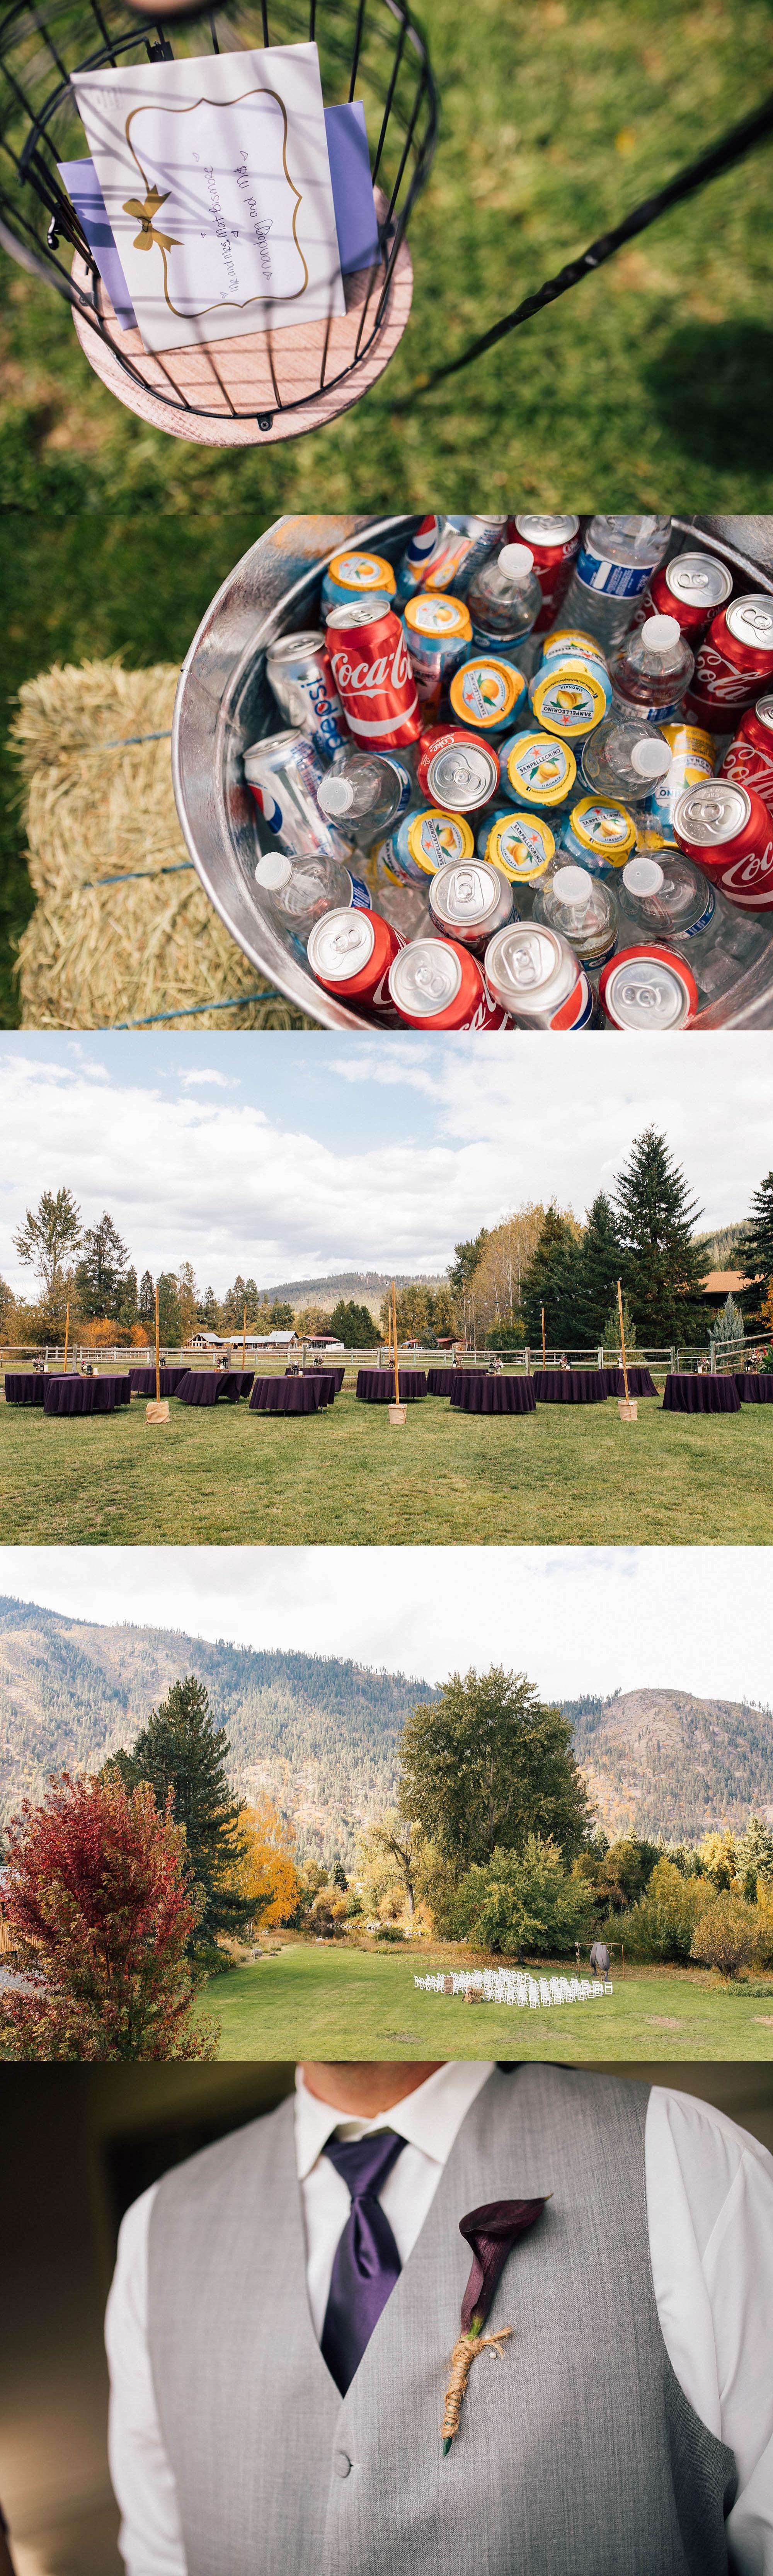 ashley_vos_seattle_ wedding_photographer_0230.jpg